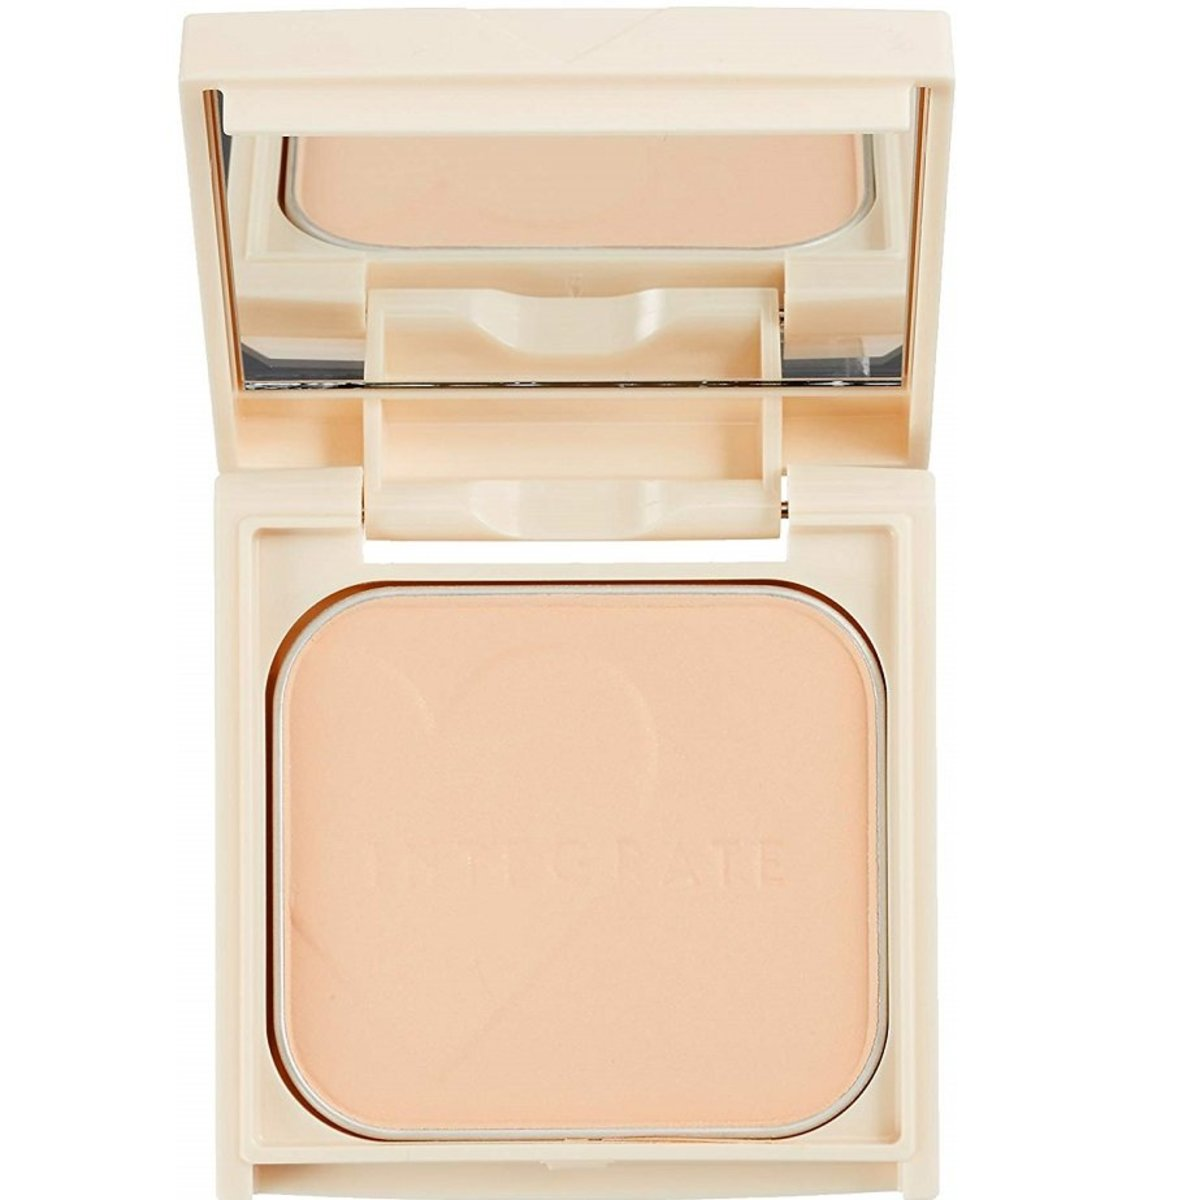 Integrate Super Keep Powder Makeup Base Face Powder 6.5g (4901872099641)